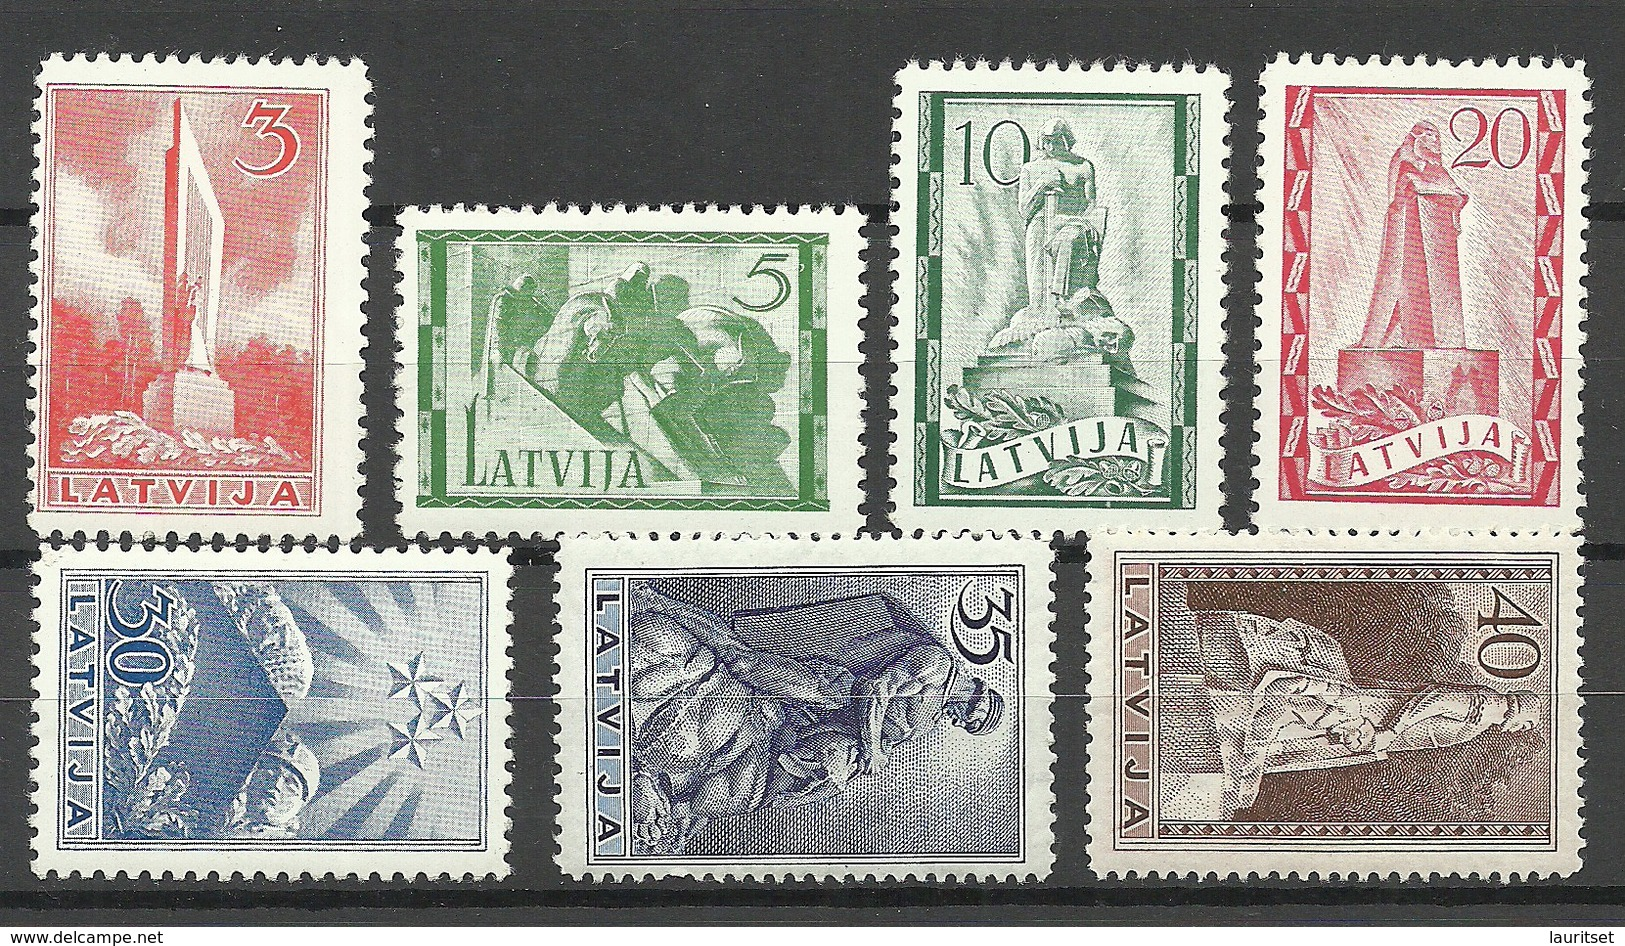 LETTLAND Latvia 1937 Michel 246 - 252 Monuments * - Lettland